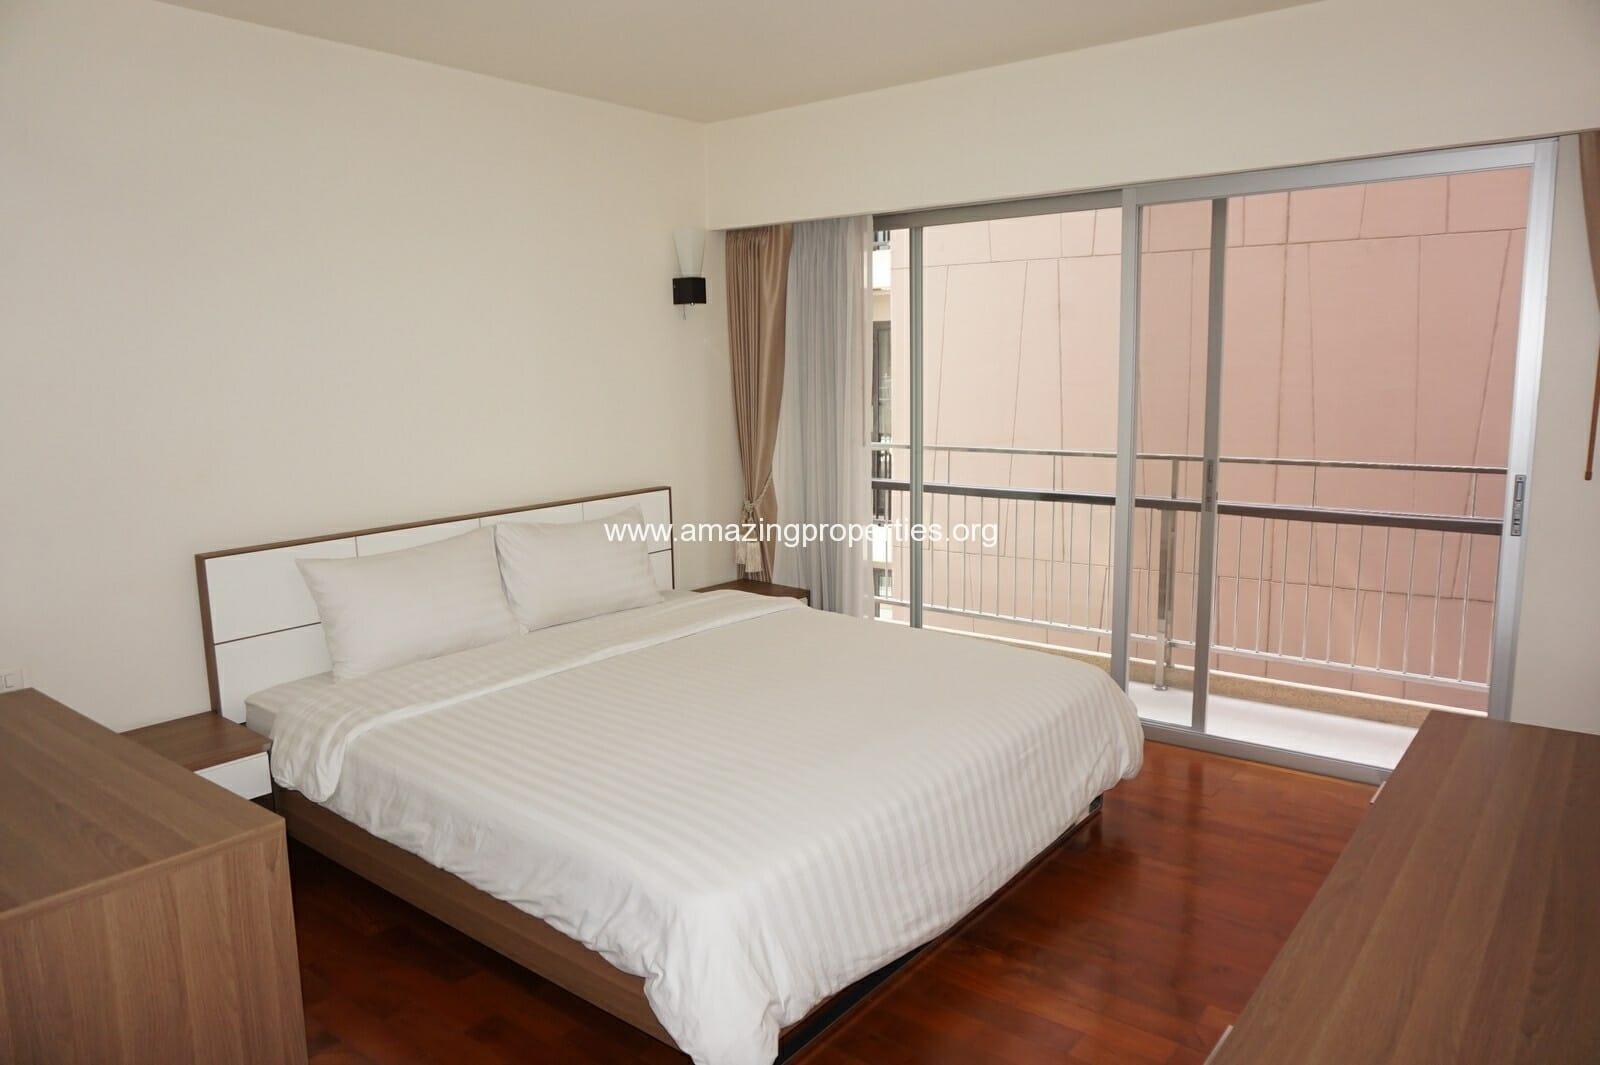 2 bedroom Baan Sukhumvit 14-2